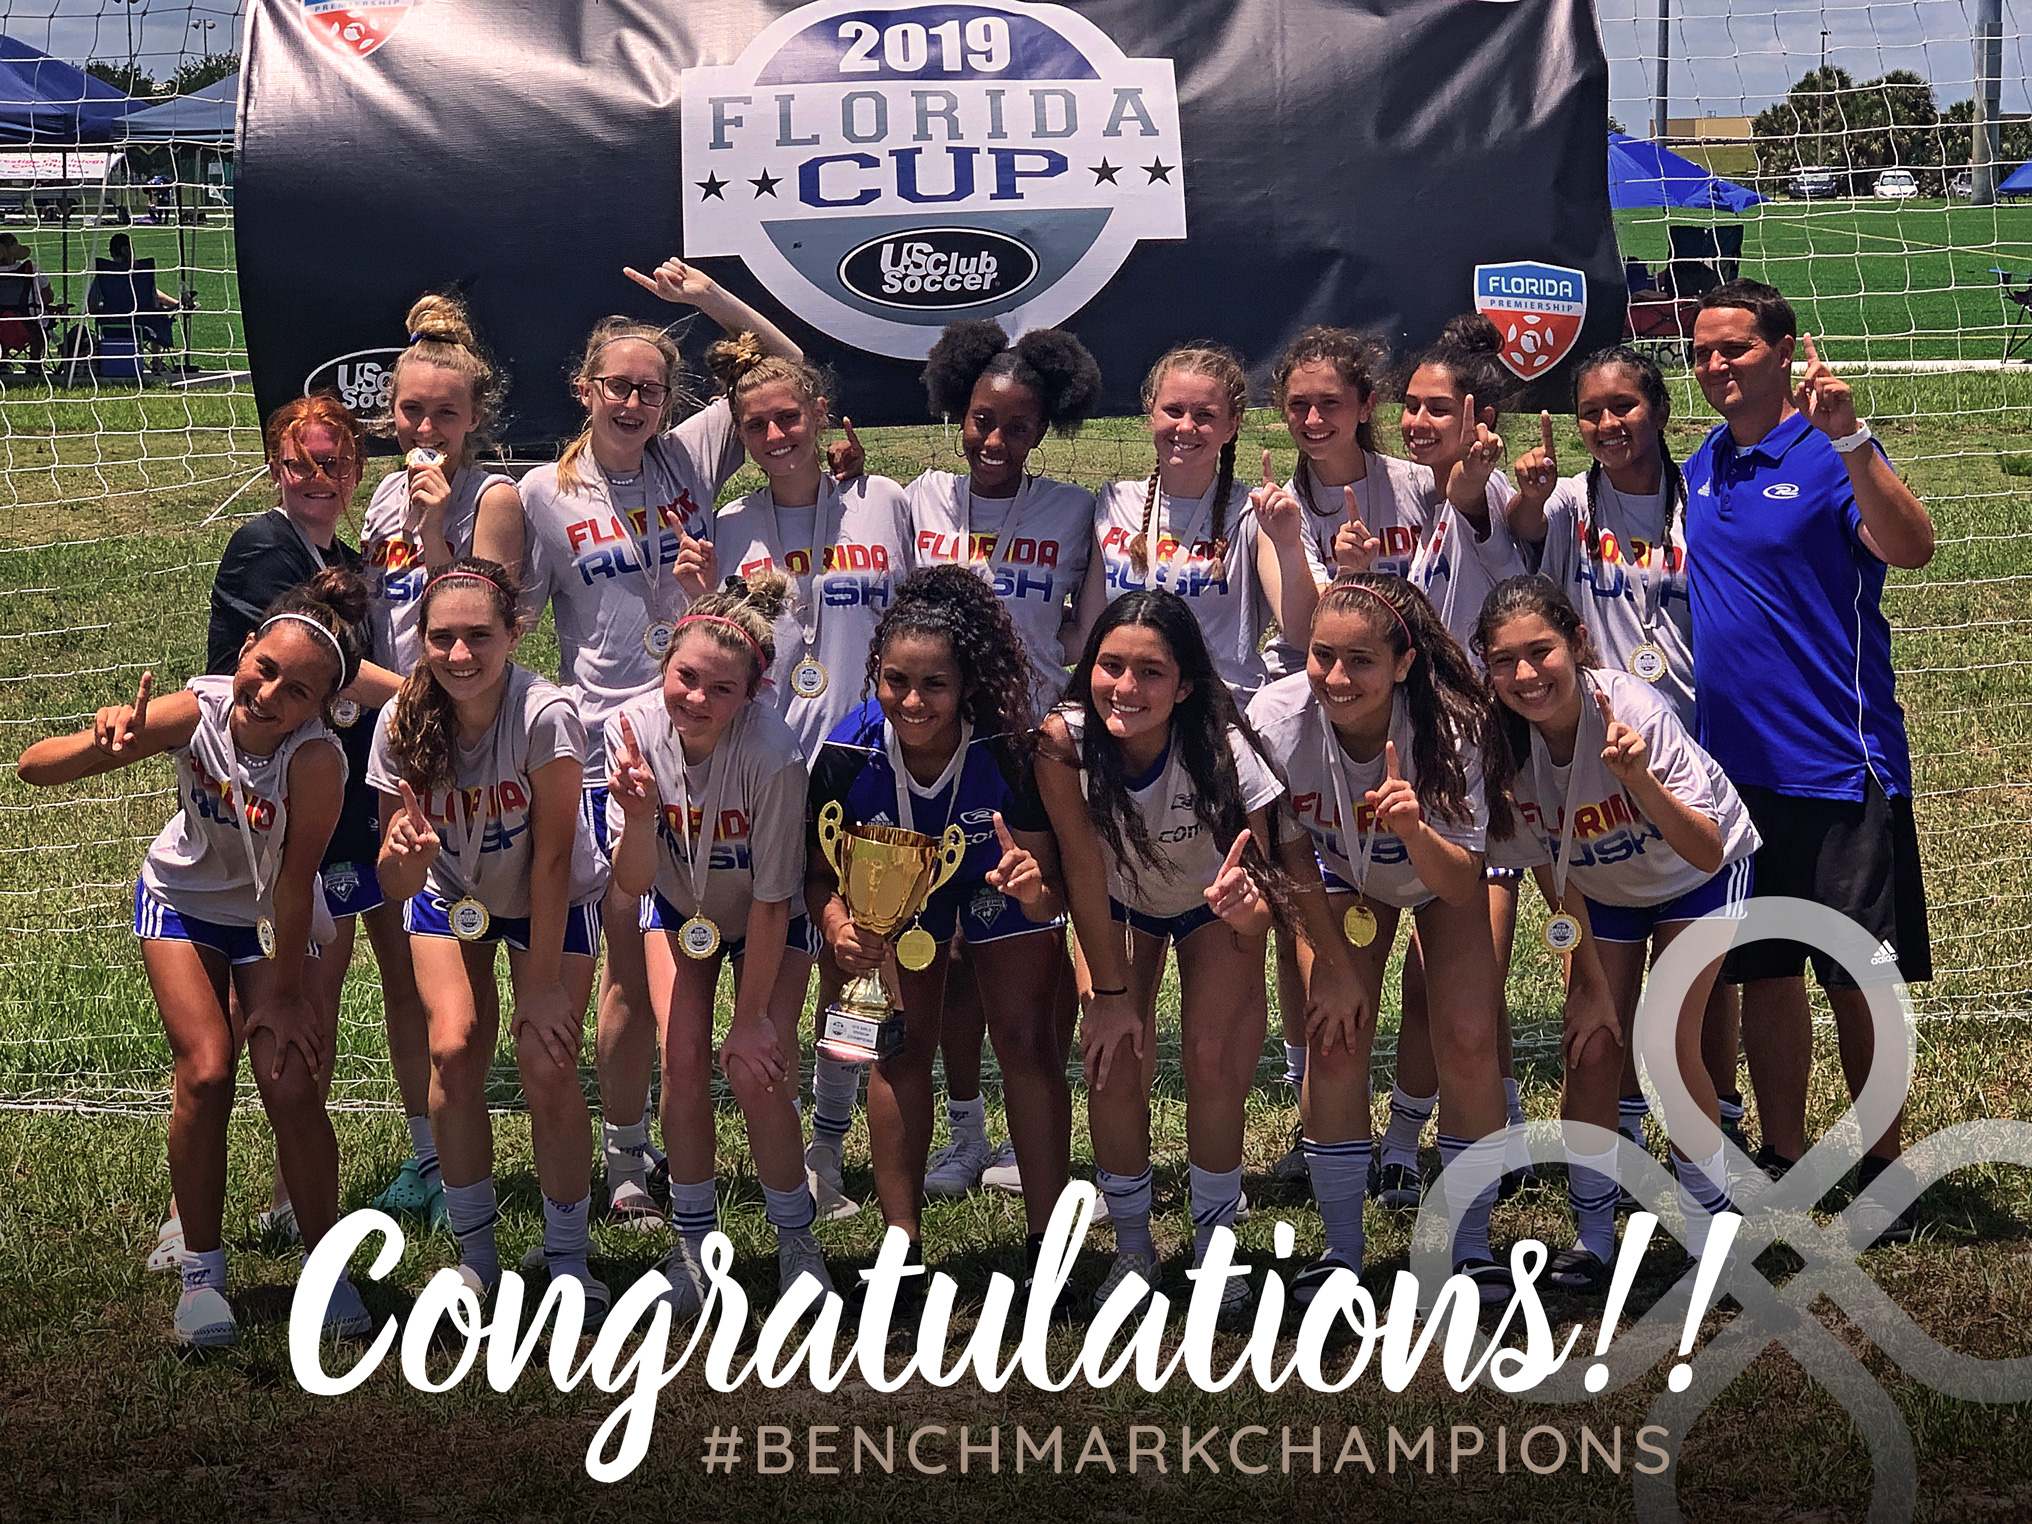 Benchmark International's Florida Rush Girls 04 Won the Florida Cup!